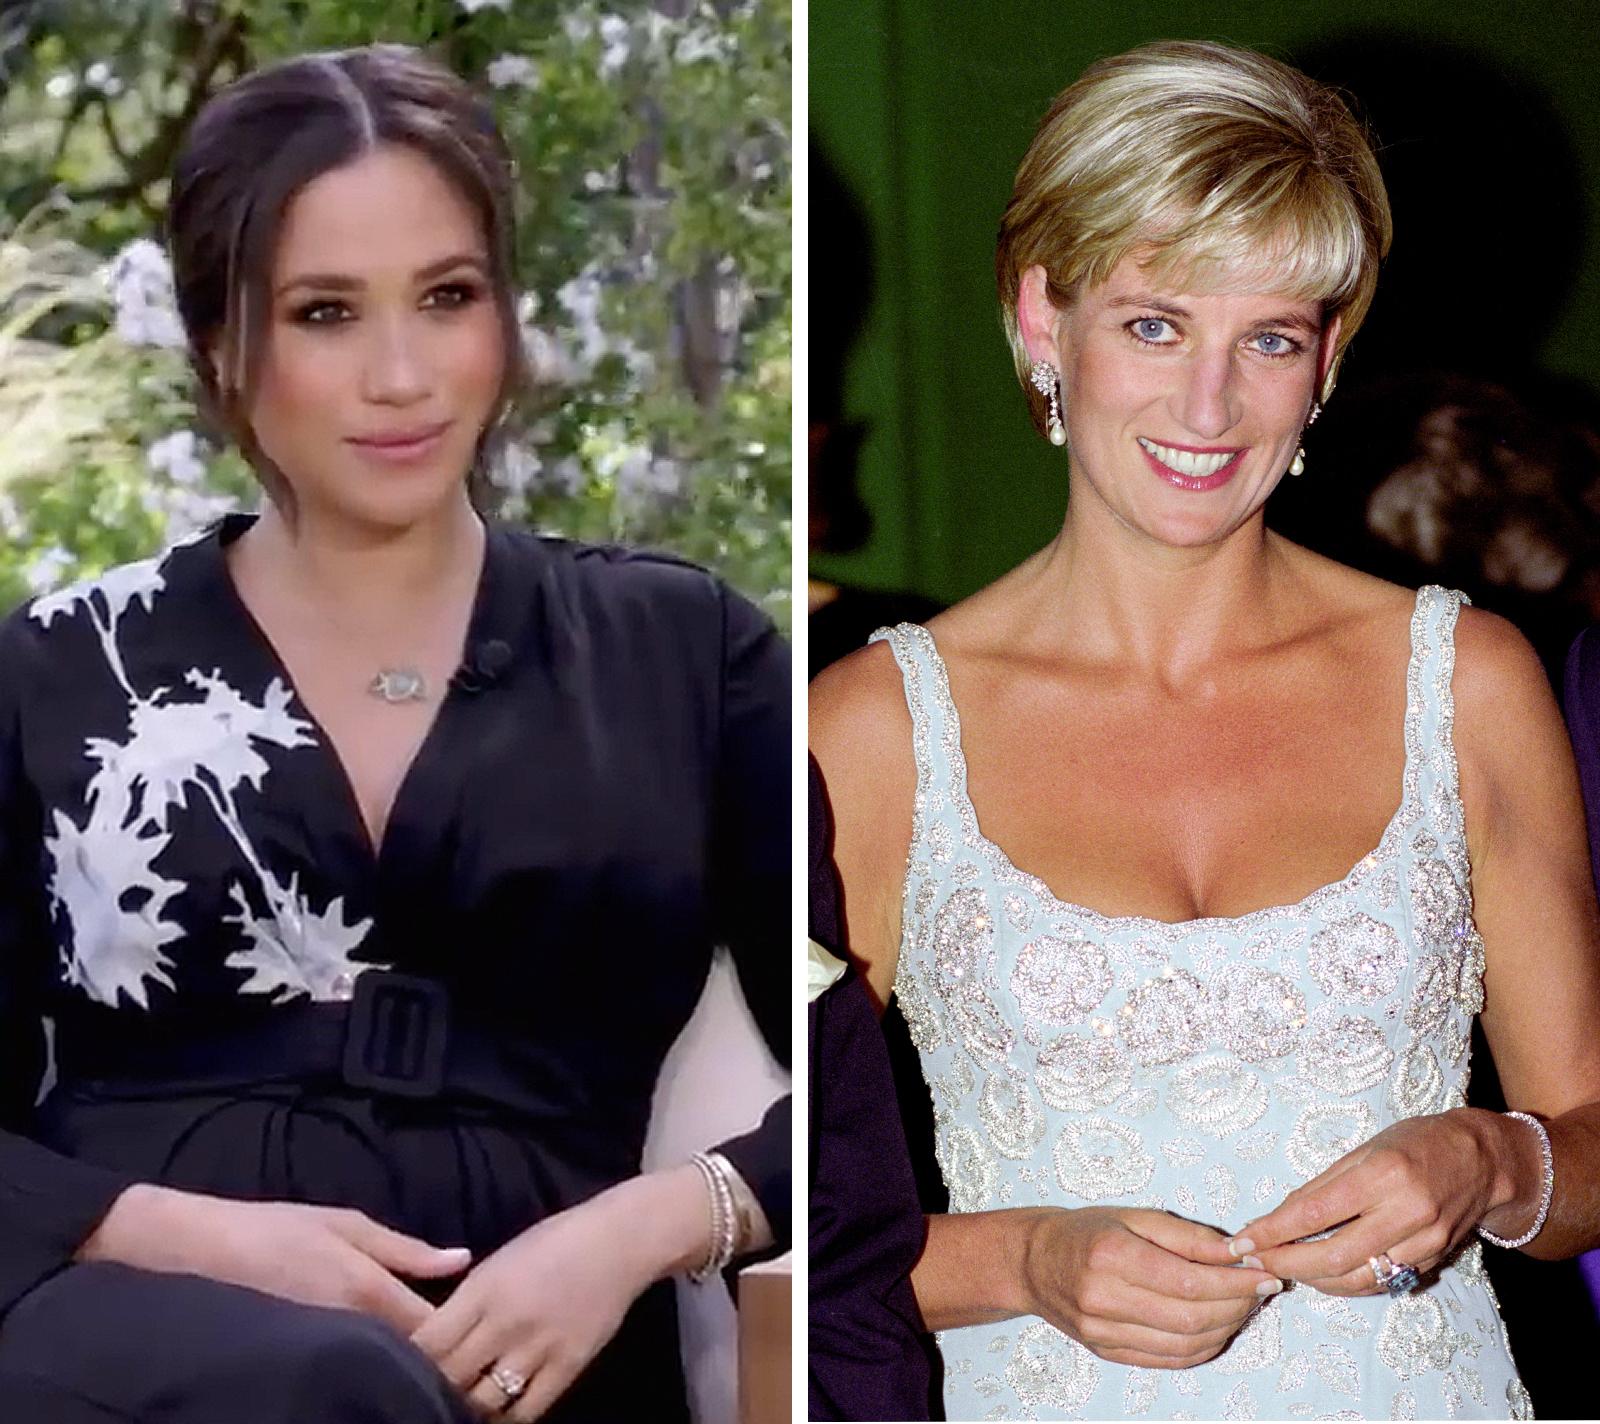 Meghan Markle y princesa Diana, entrevista con Oprah Winfrey